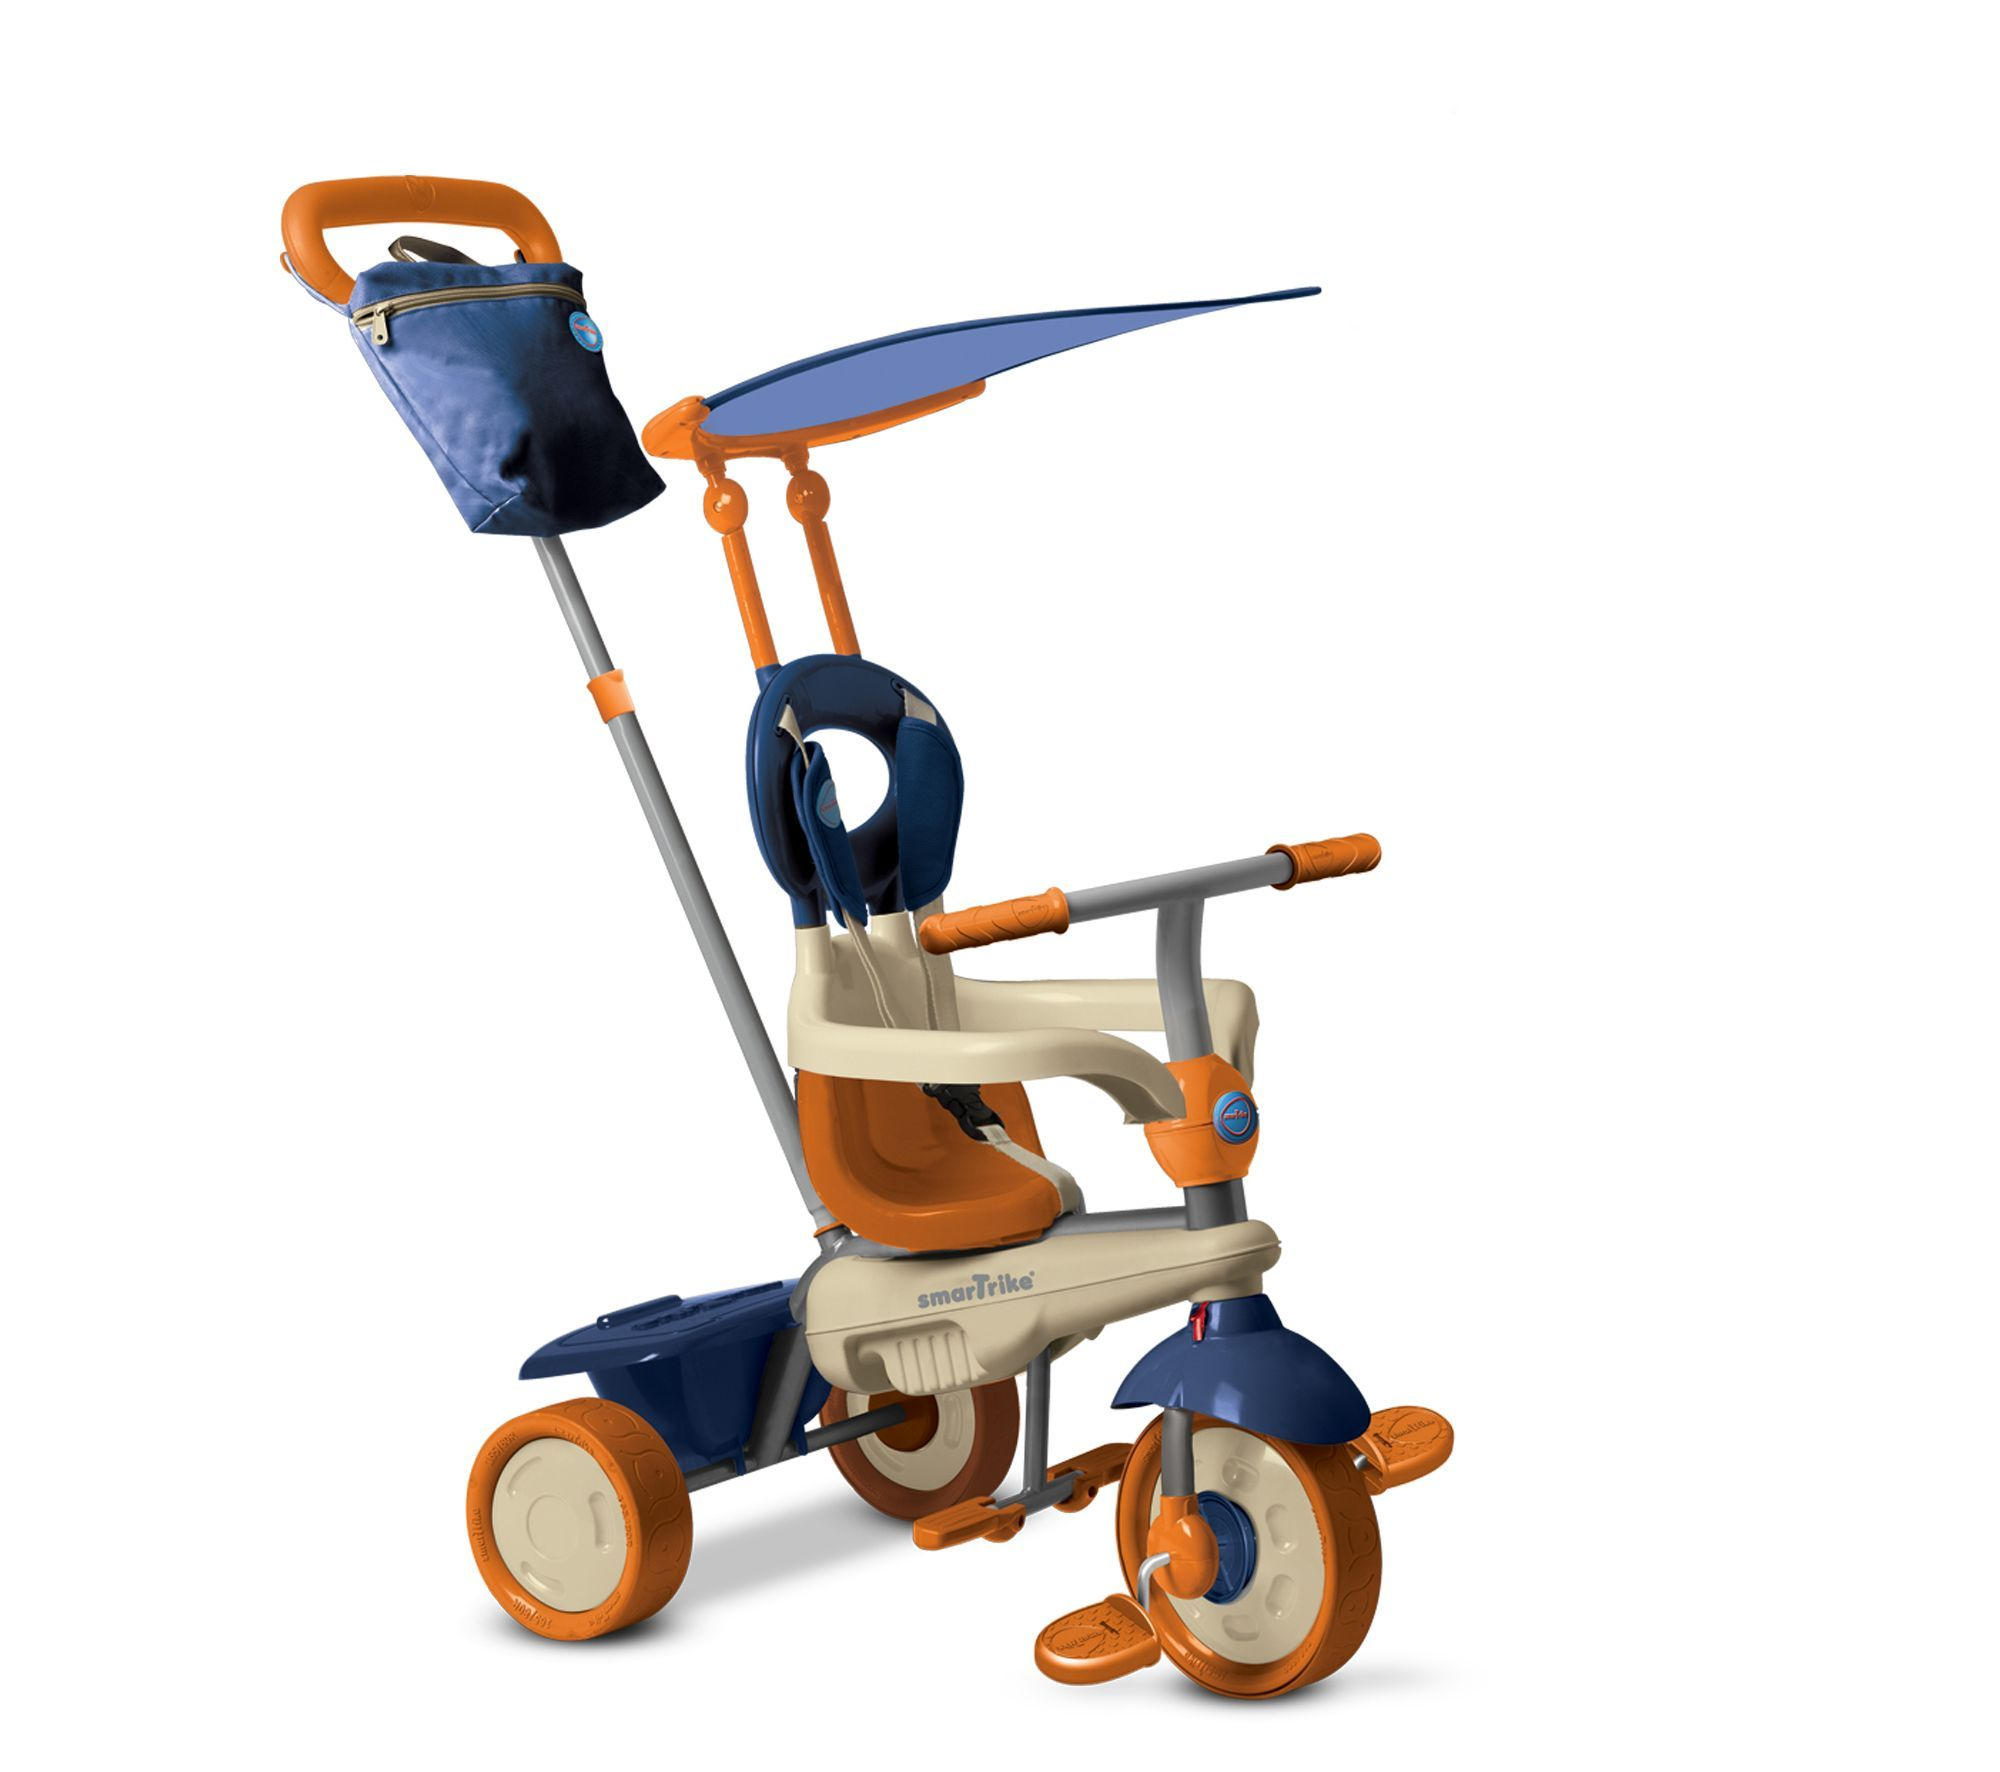 Smart Trike Vanilla 4in1 Blue Tricycle, Trike, Early